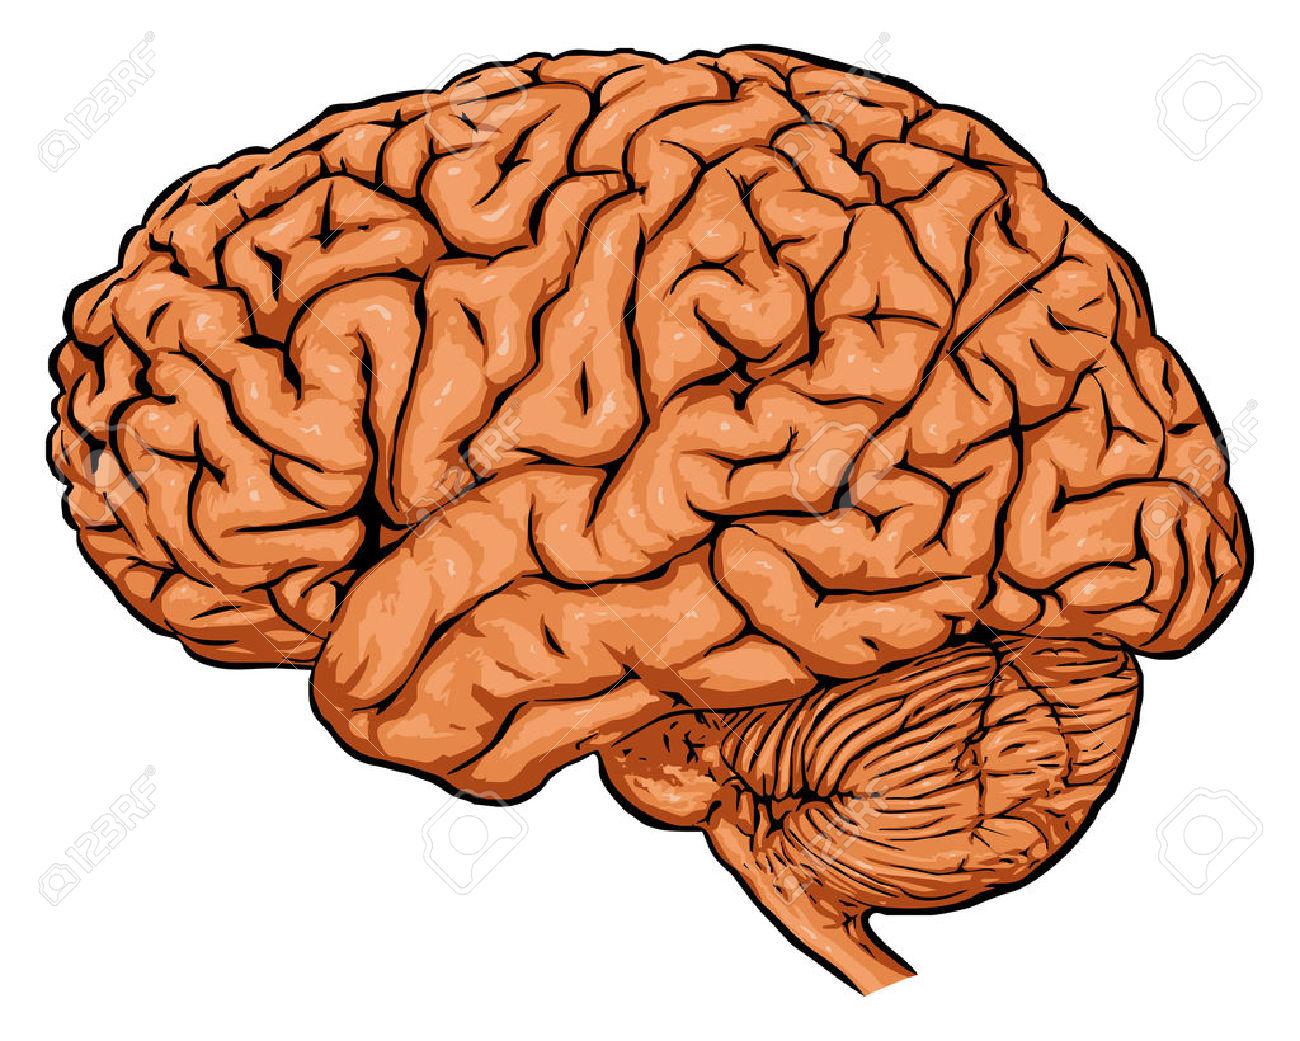 Anatomy clipart brain Brain Clipart Brain of art